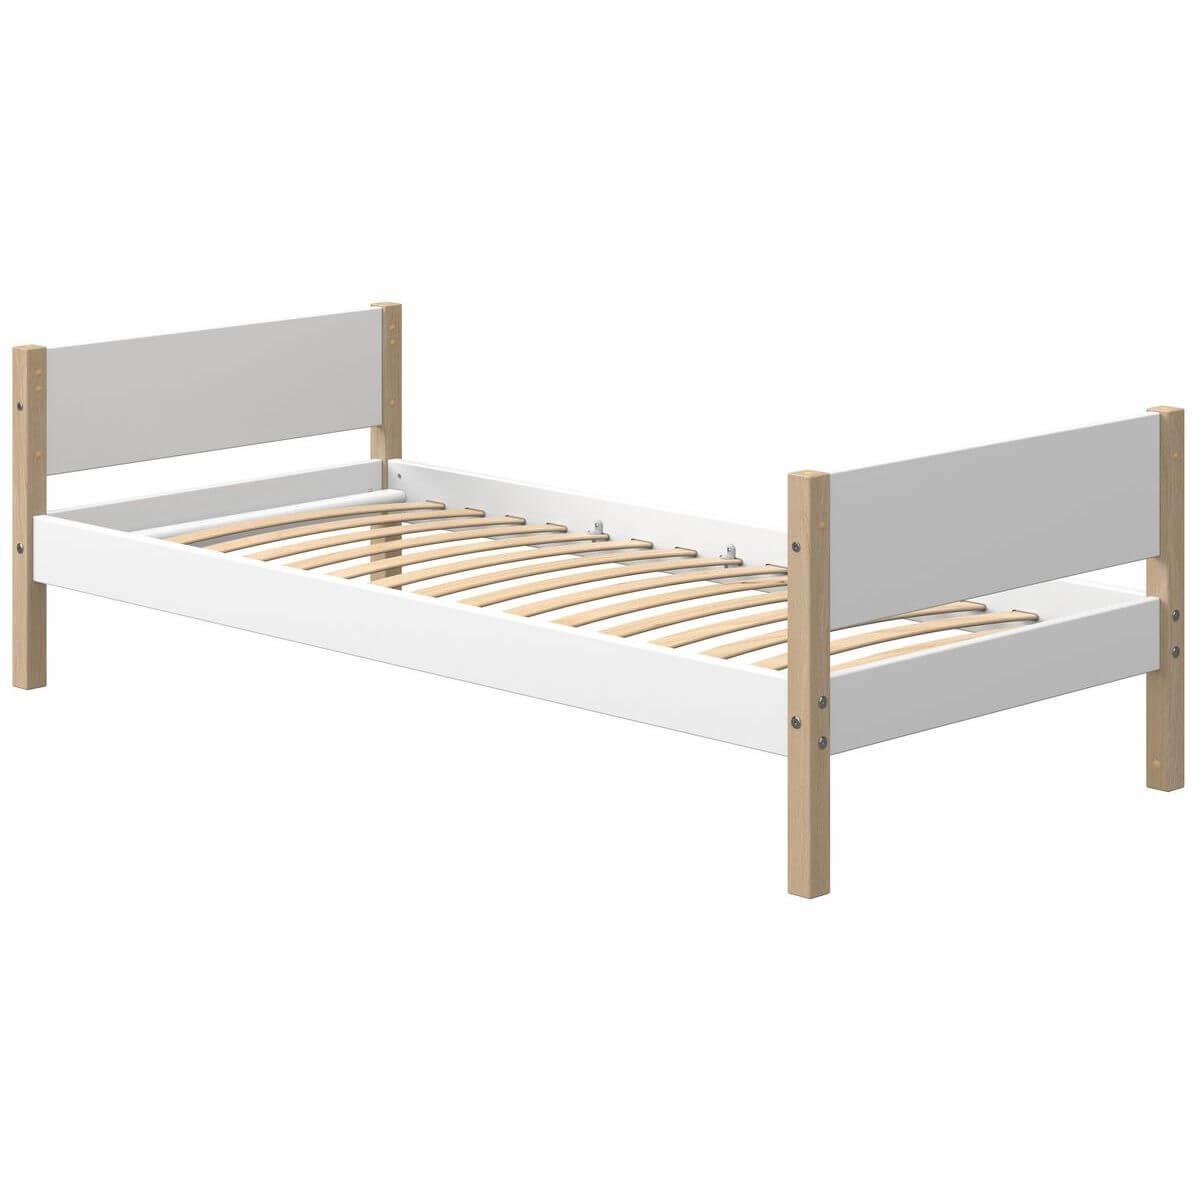 Kinderbett 200x90cm NOR Flexa Eiche-weiß